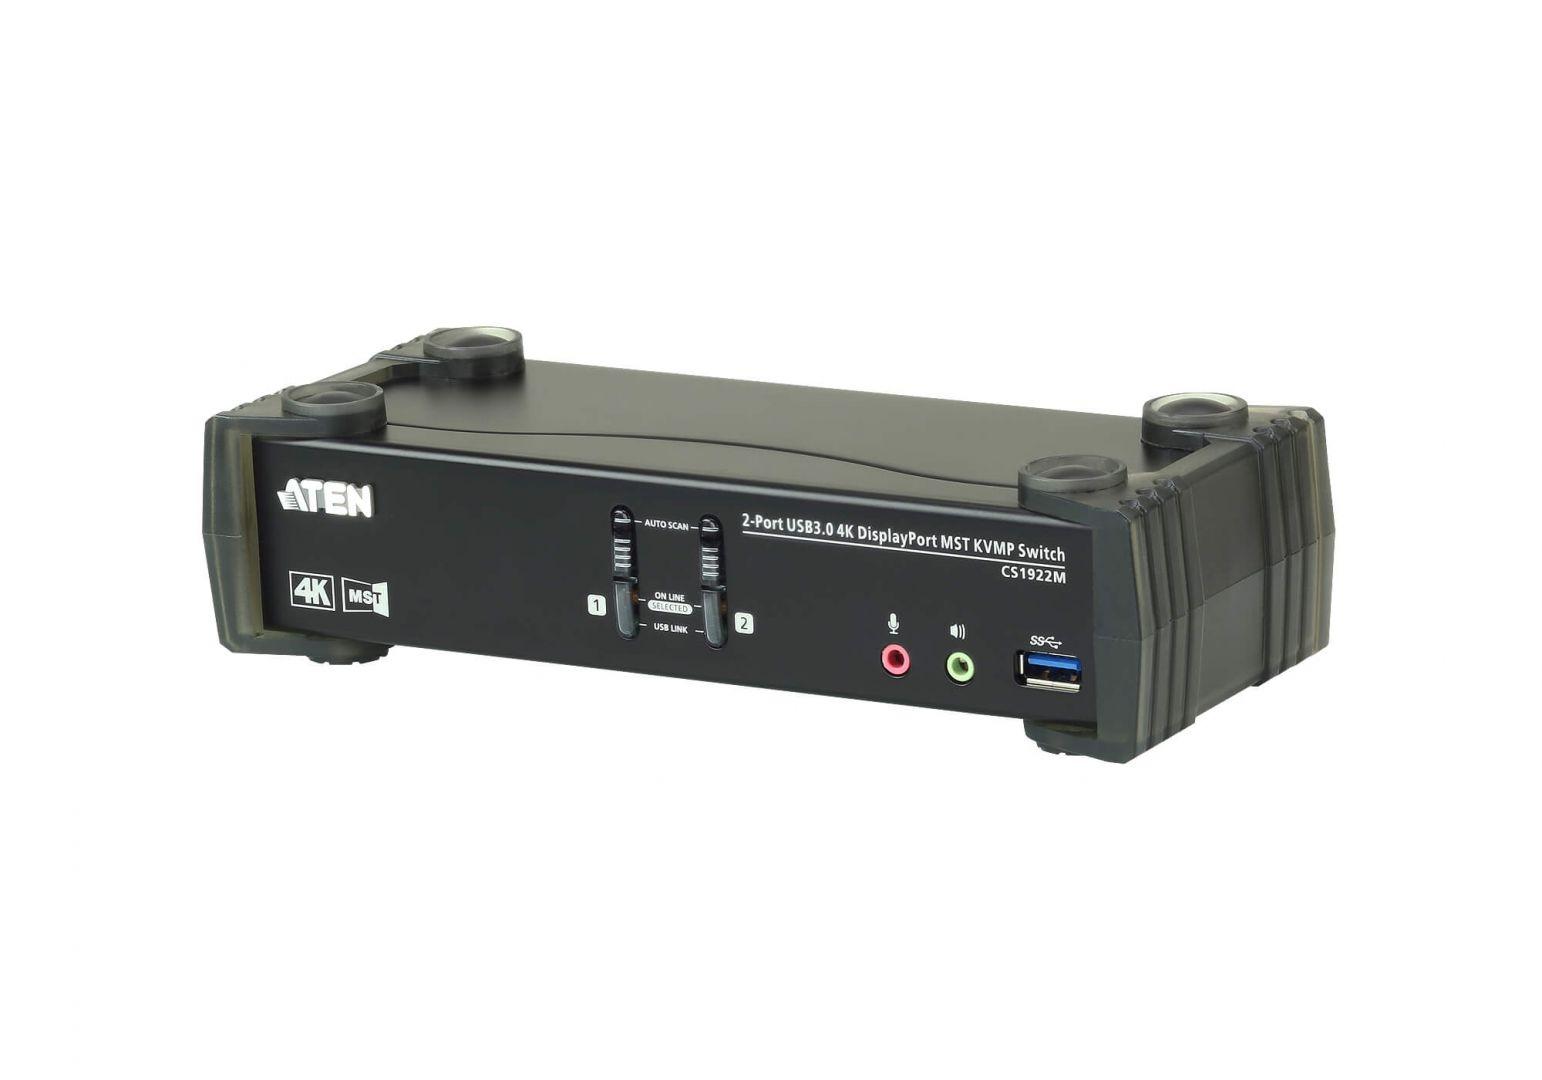 ATEN CS1922M 2-Port USB 3.0 4K DisplayPort MST KVMP Switch (CS1922M)